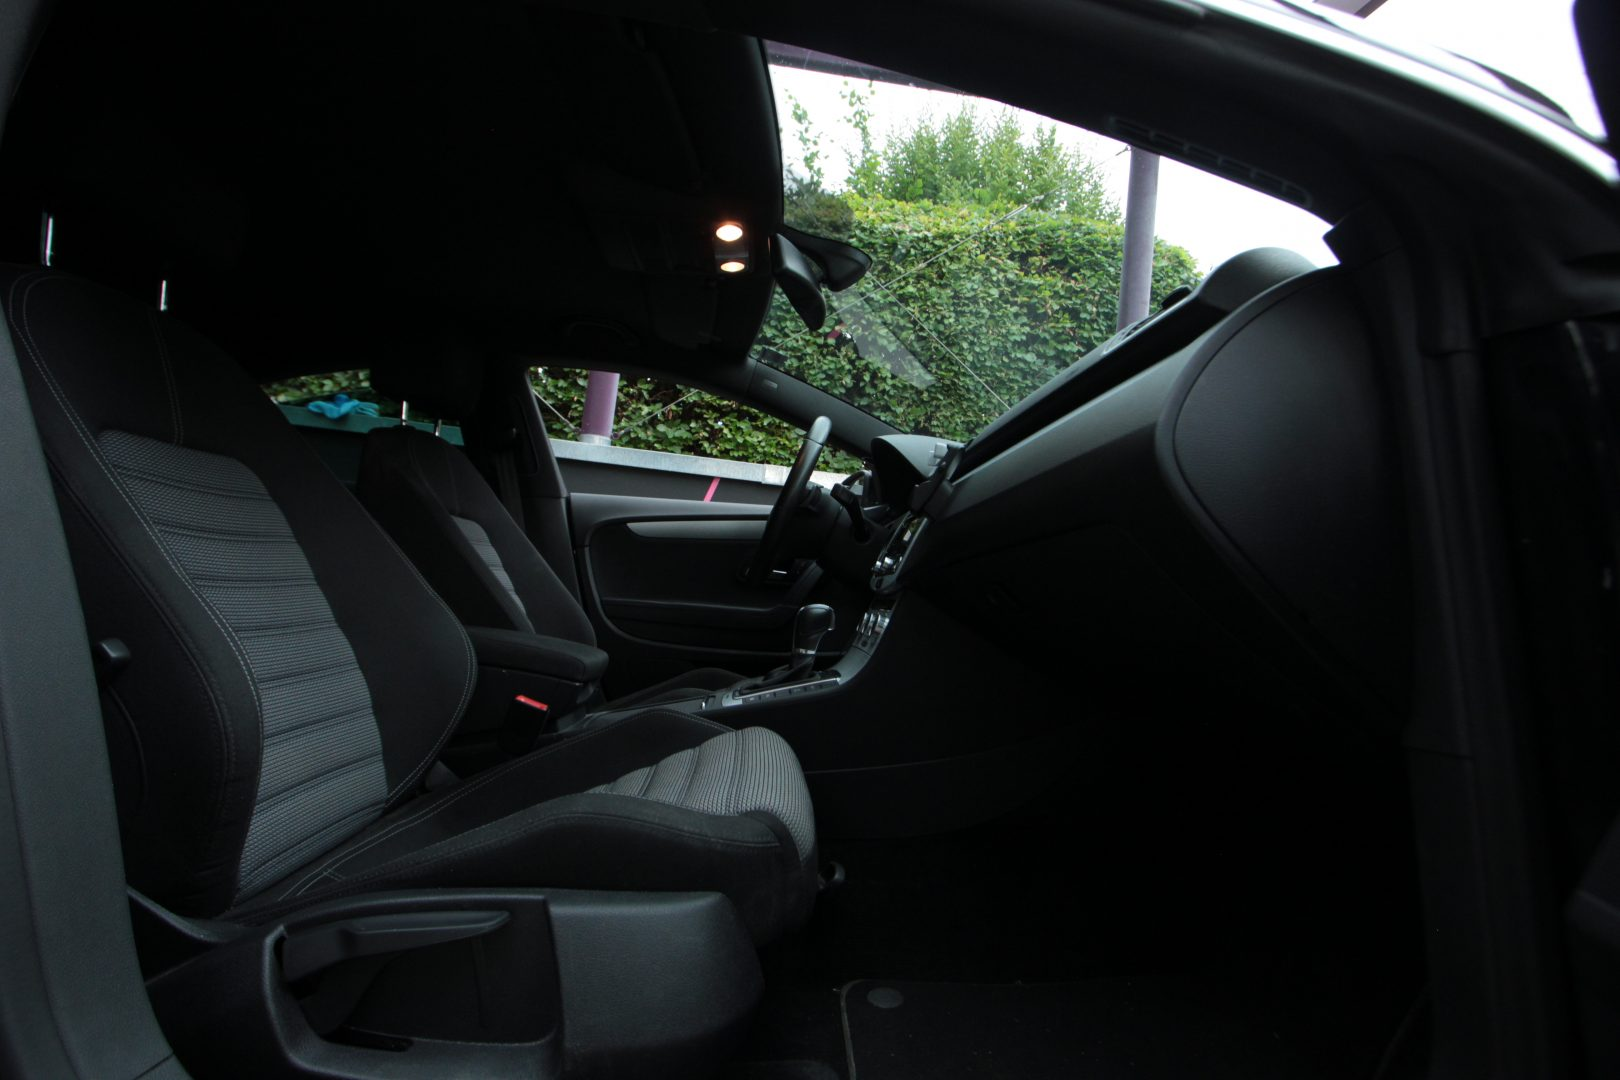 AIL VW CC 2.0TDI Basis BMT 4Motion DSG 8